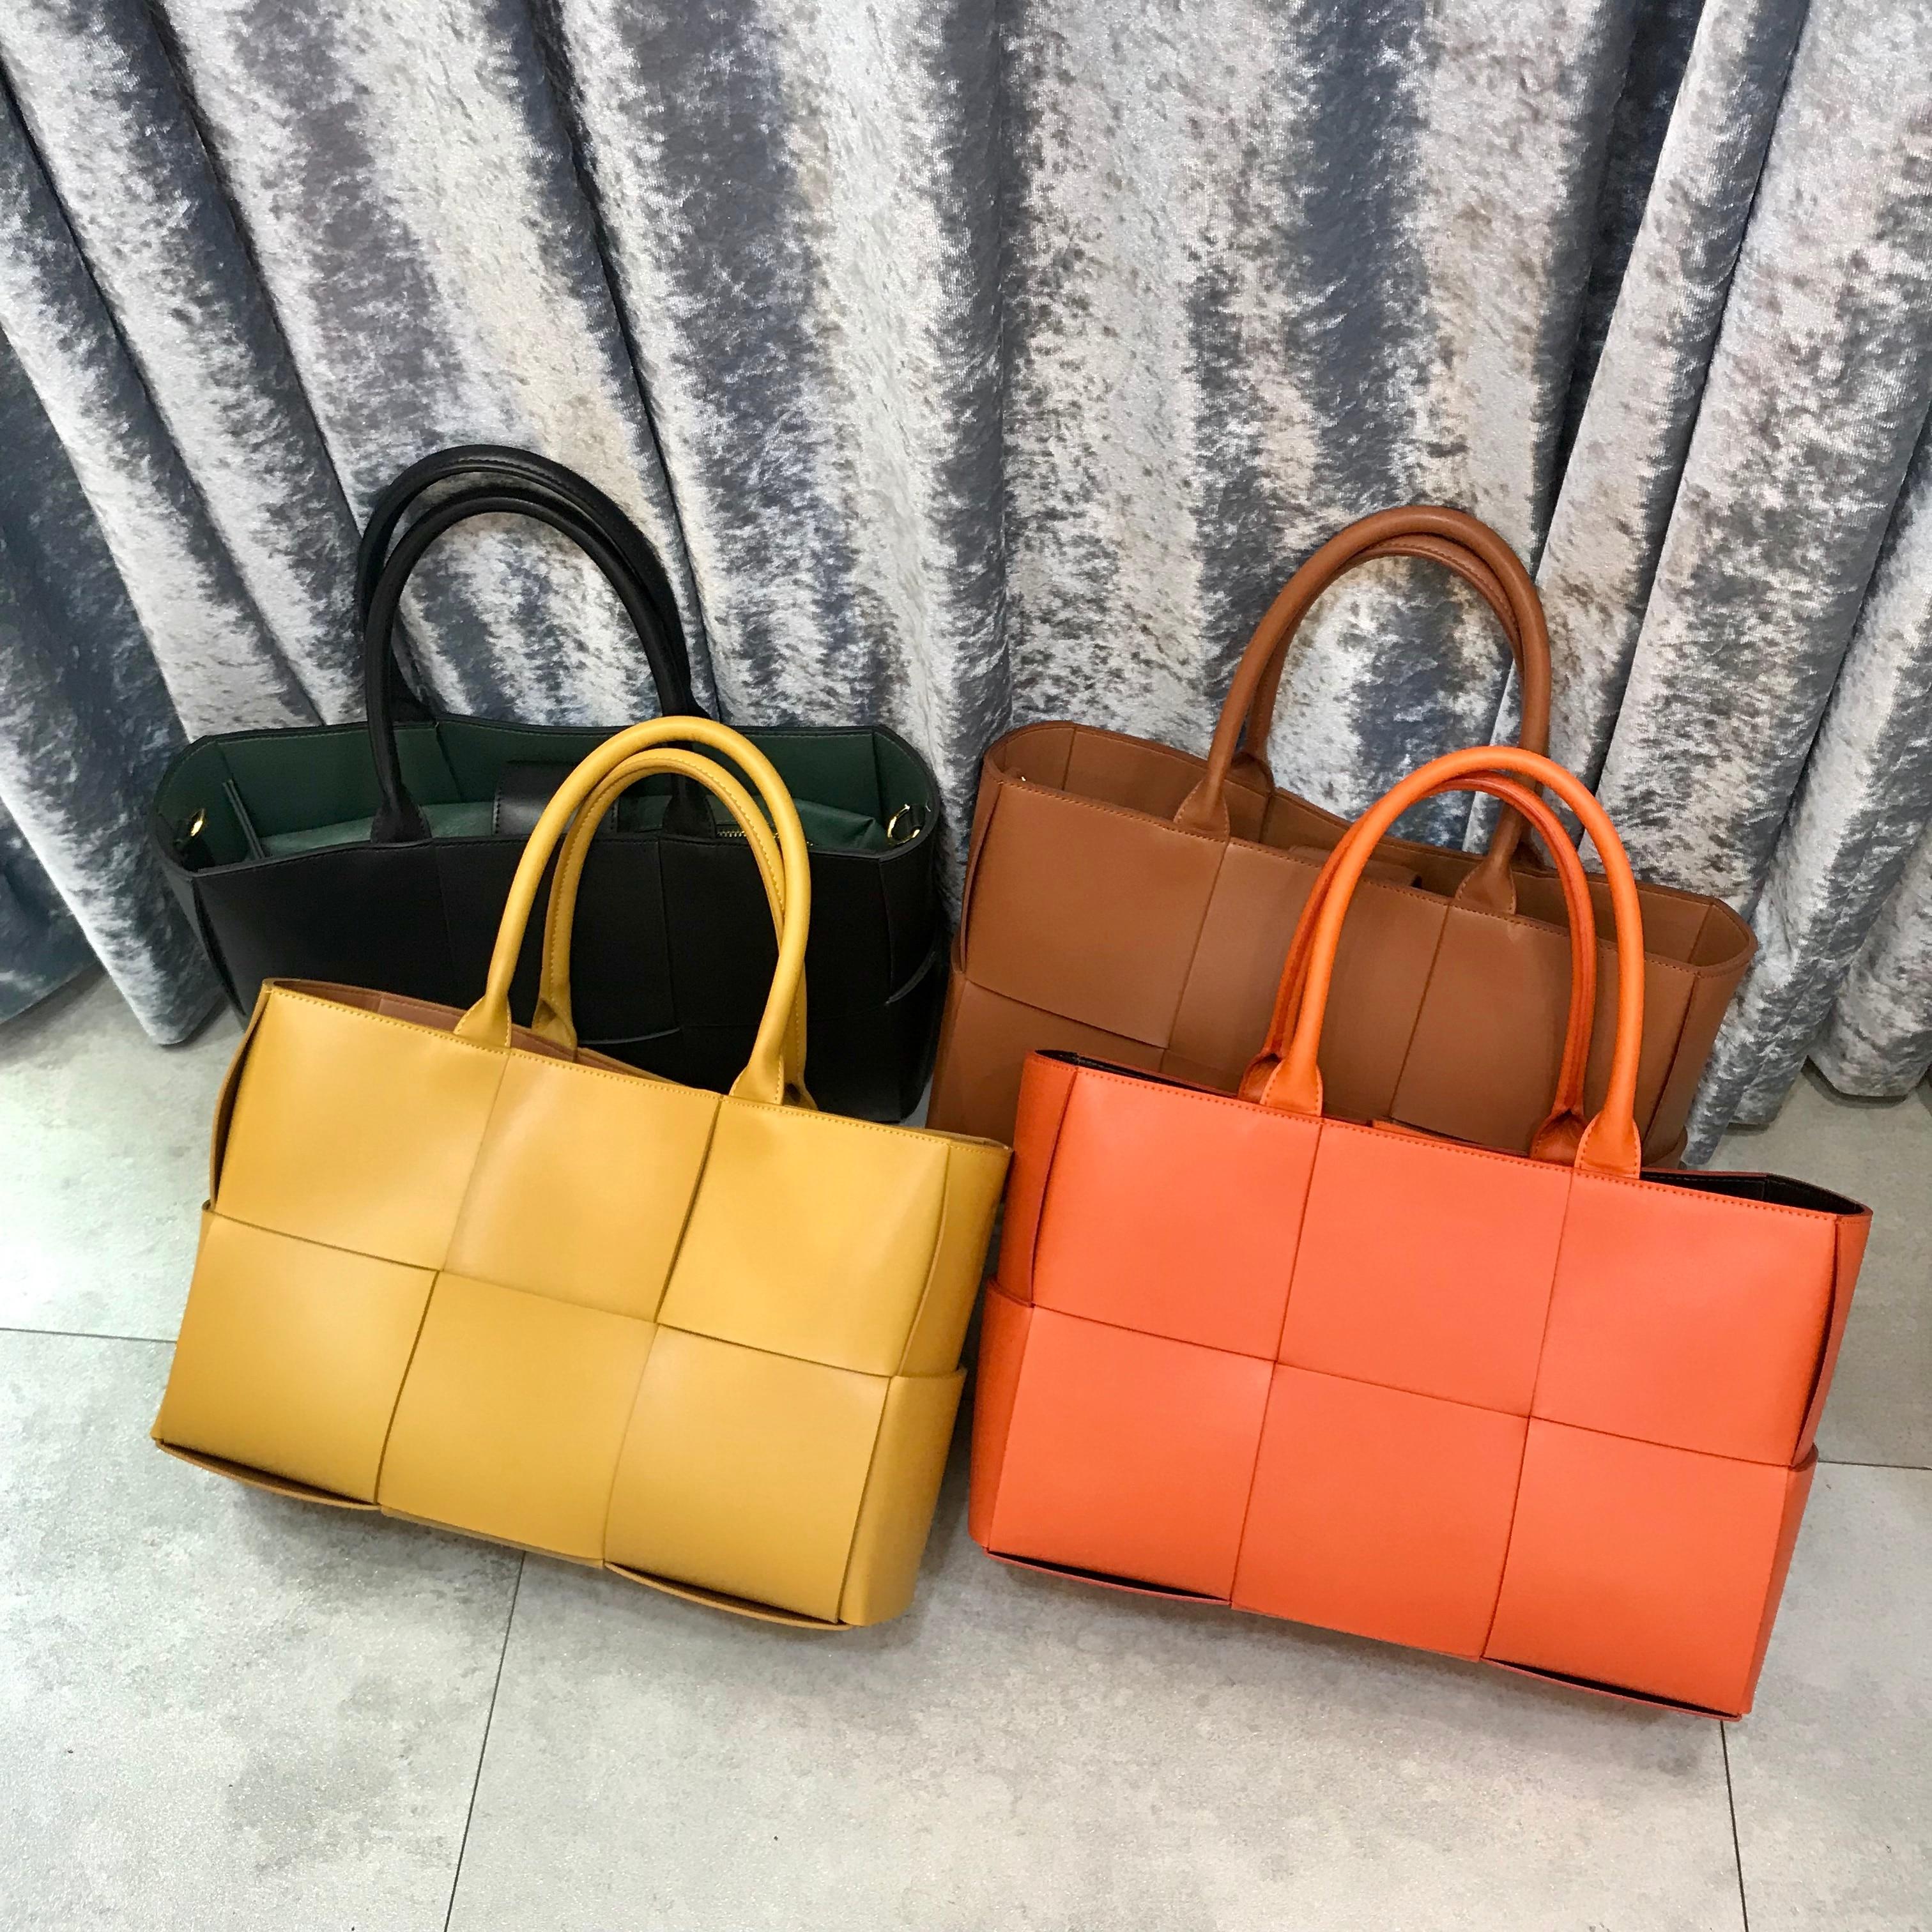 Kafunila Famous Brand Woman Bags 2019 Shoulder Bag Female Genuine Leather Luxury Handbags Women Bags Designer Tote Bags Bolsa